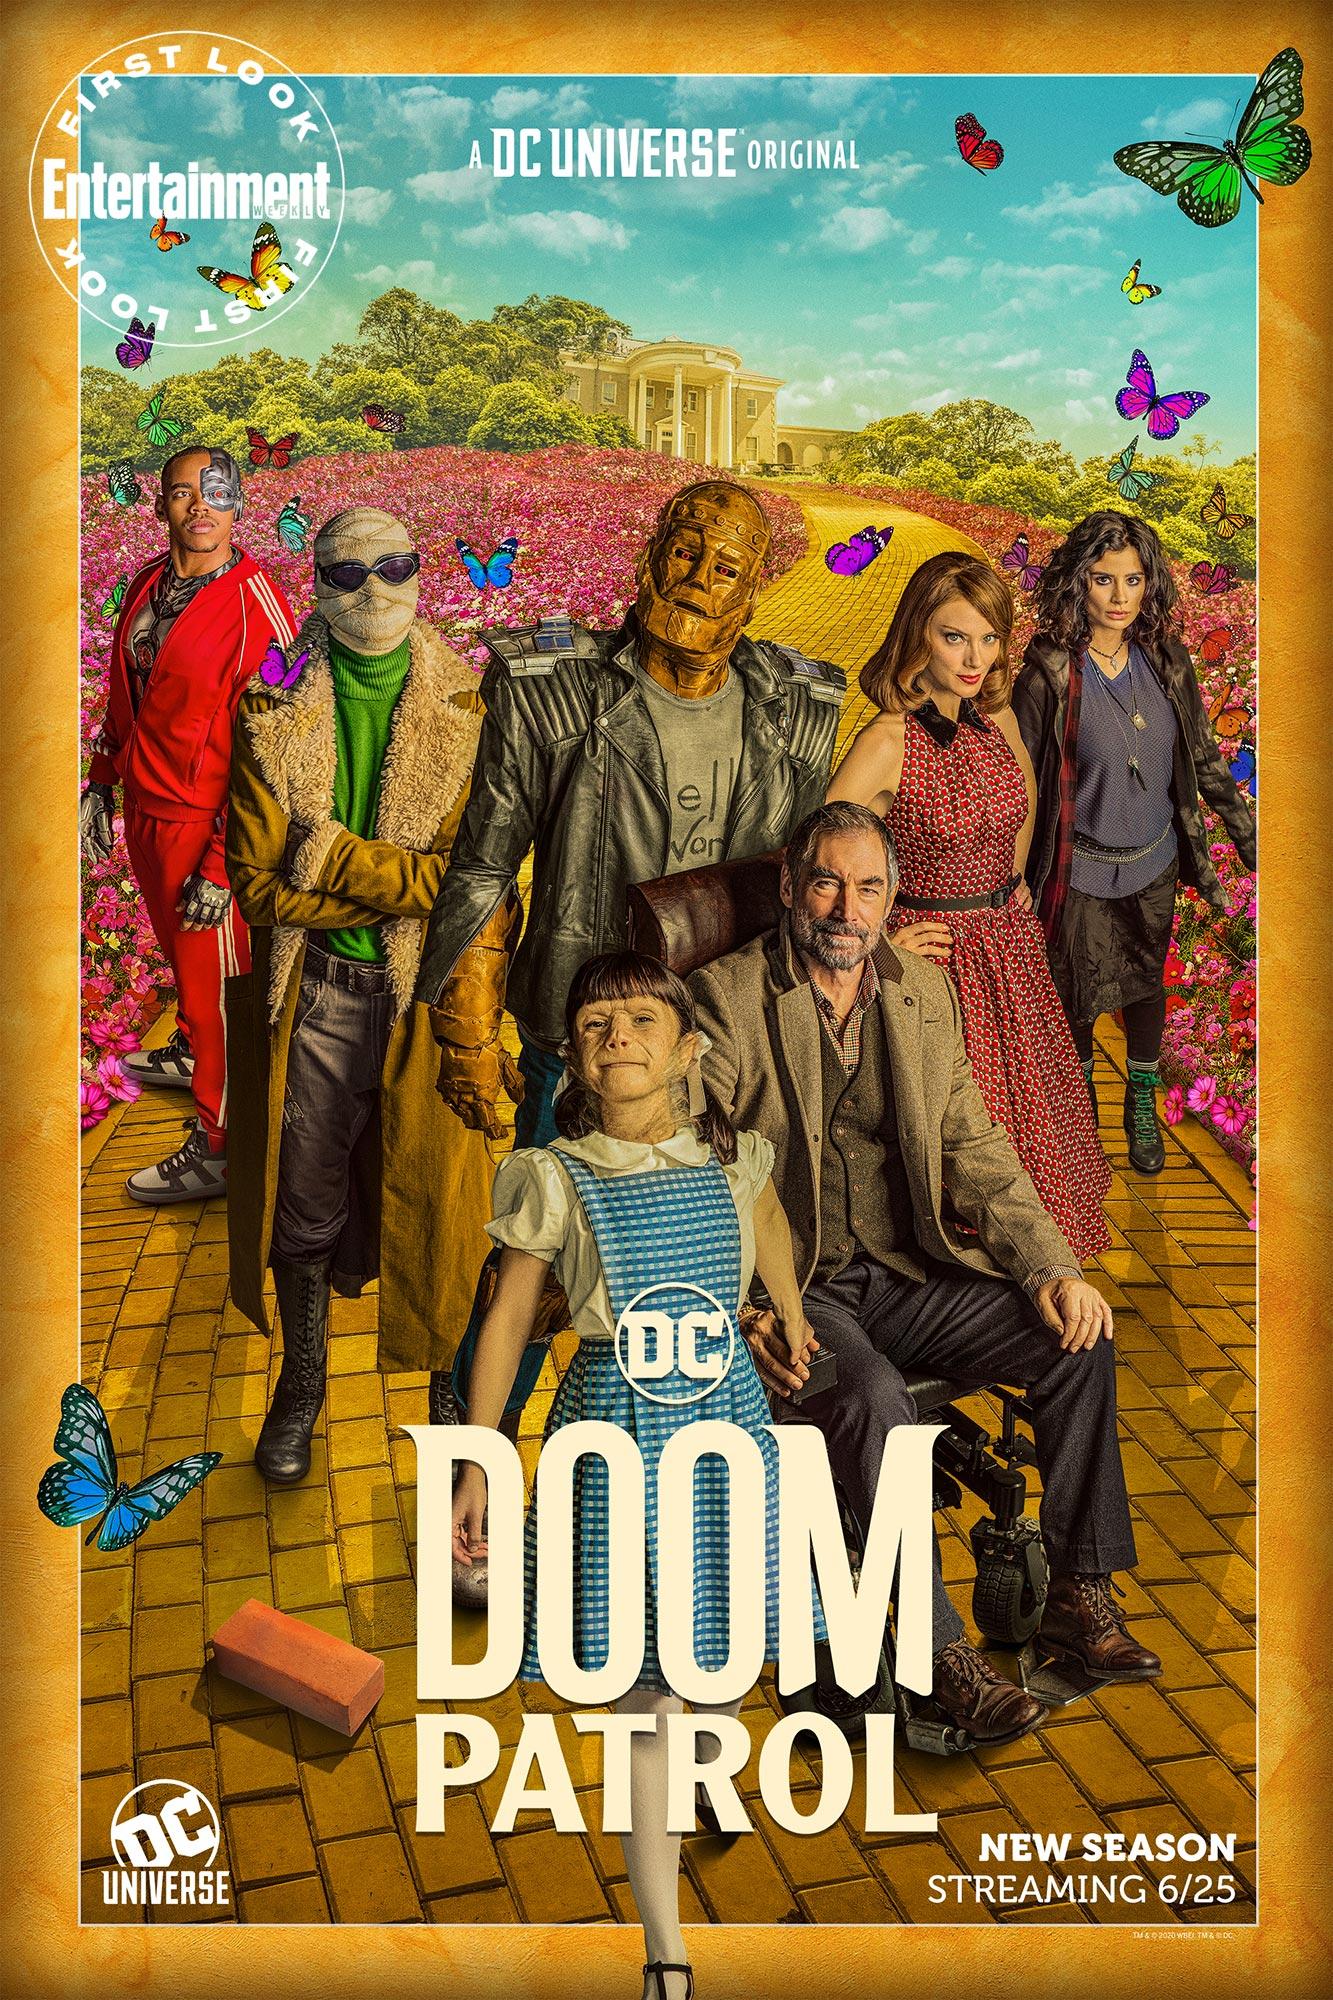 Doom Patrol Season 2 Photos Dorothy Spinner Arrives Mark Sheppard Returns Ew Com